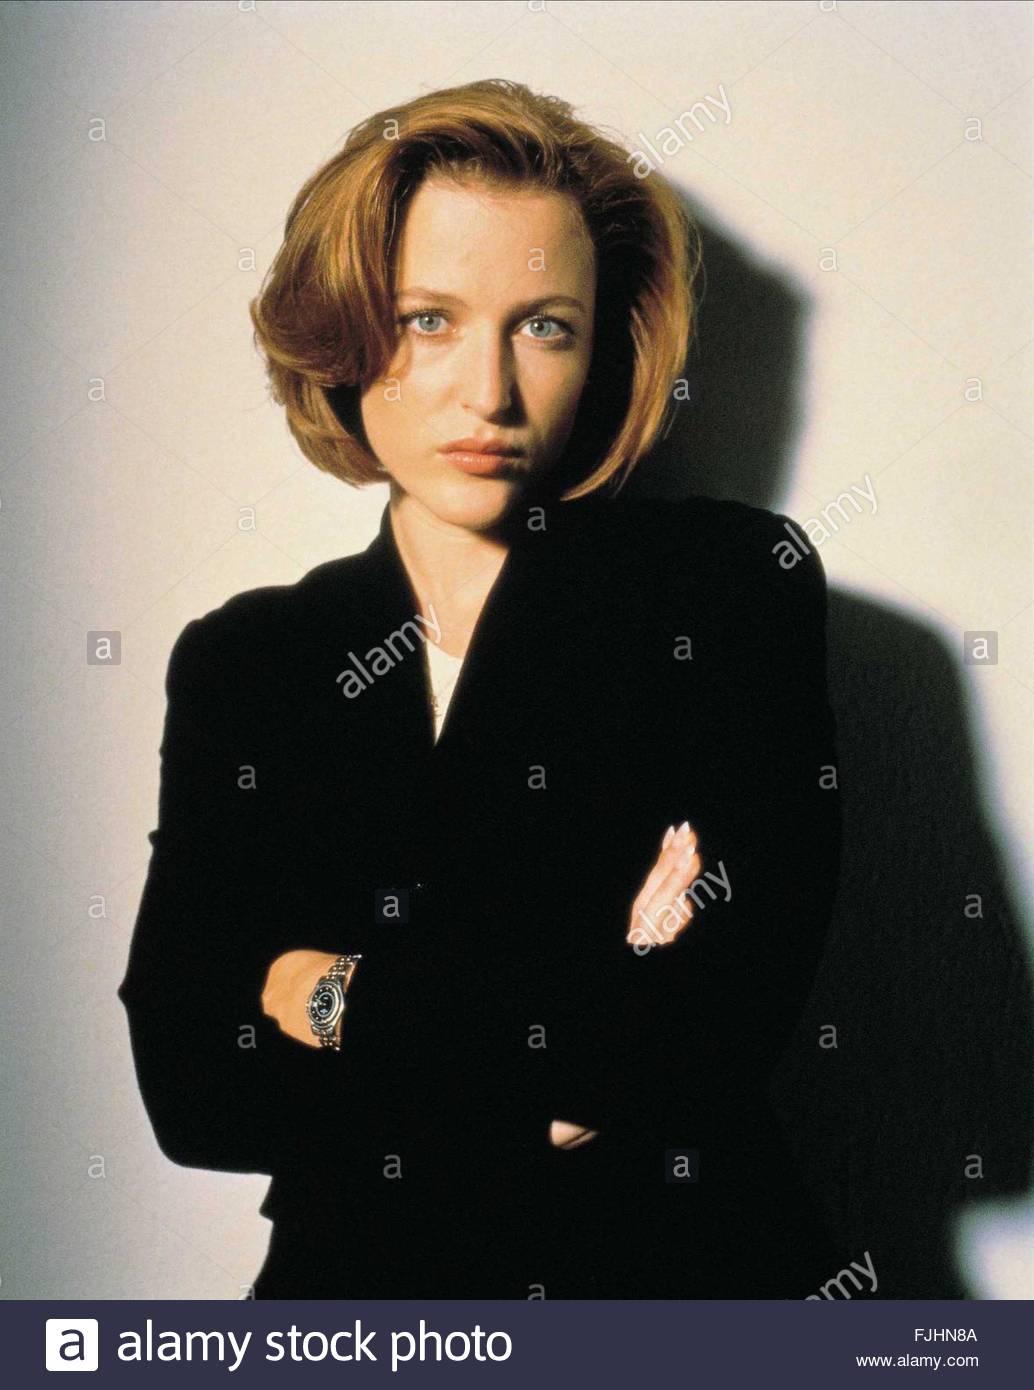 GILLIAN ANDERSON THE X FILES (1993) Stock Photo